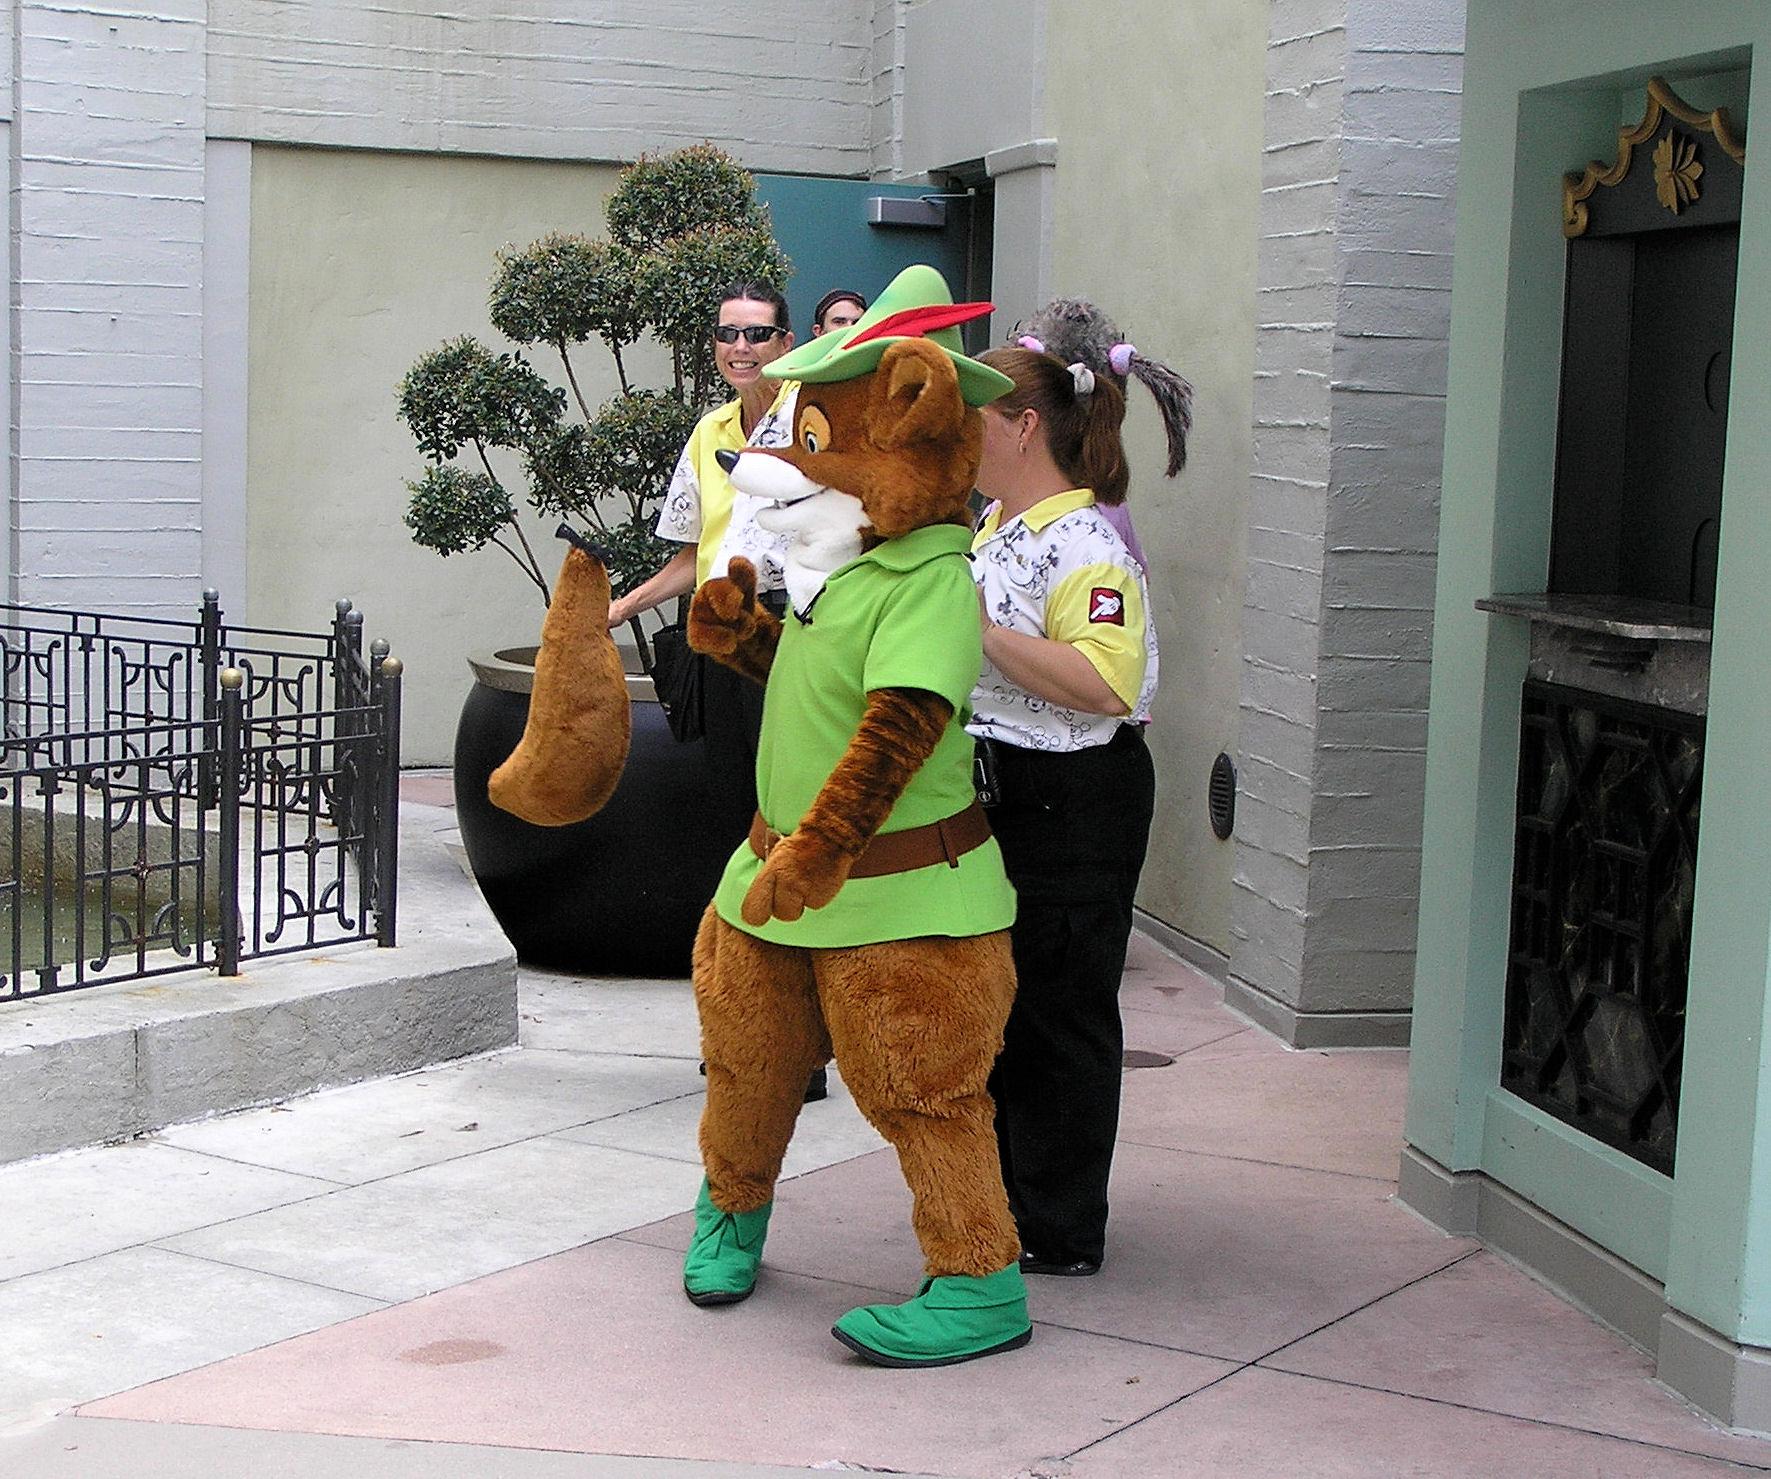 Disney World Wardrobe Malfunction